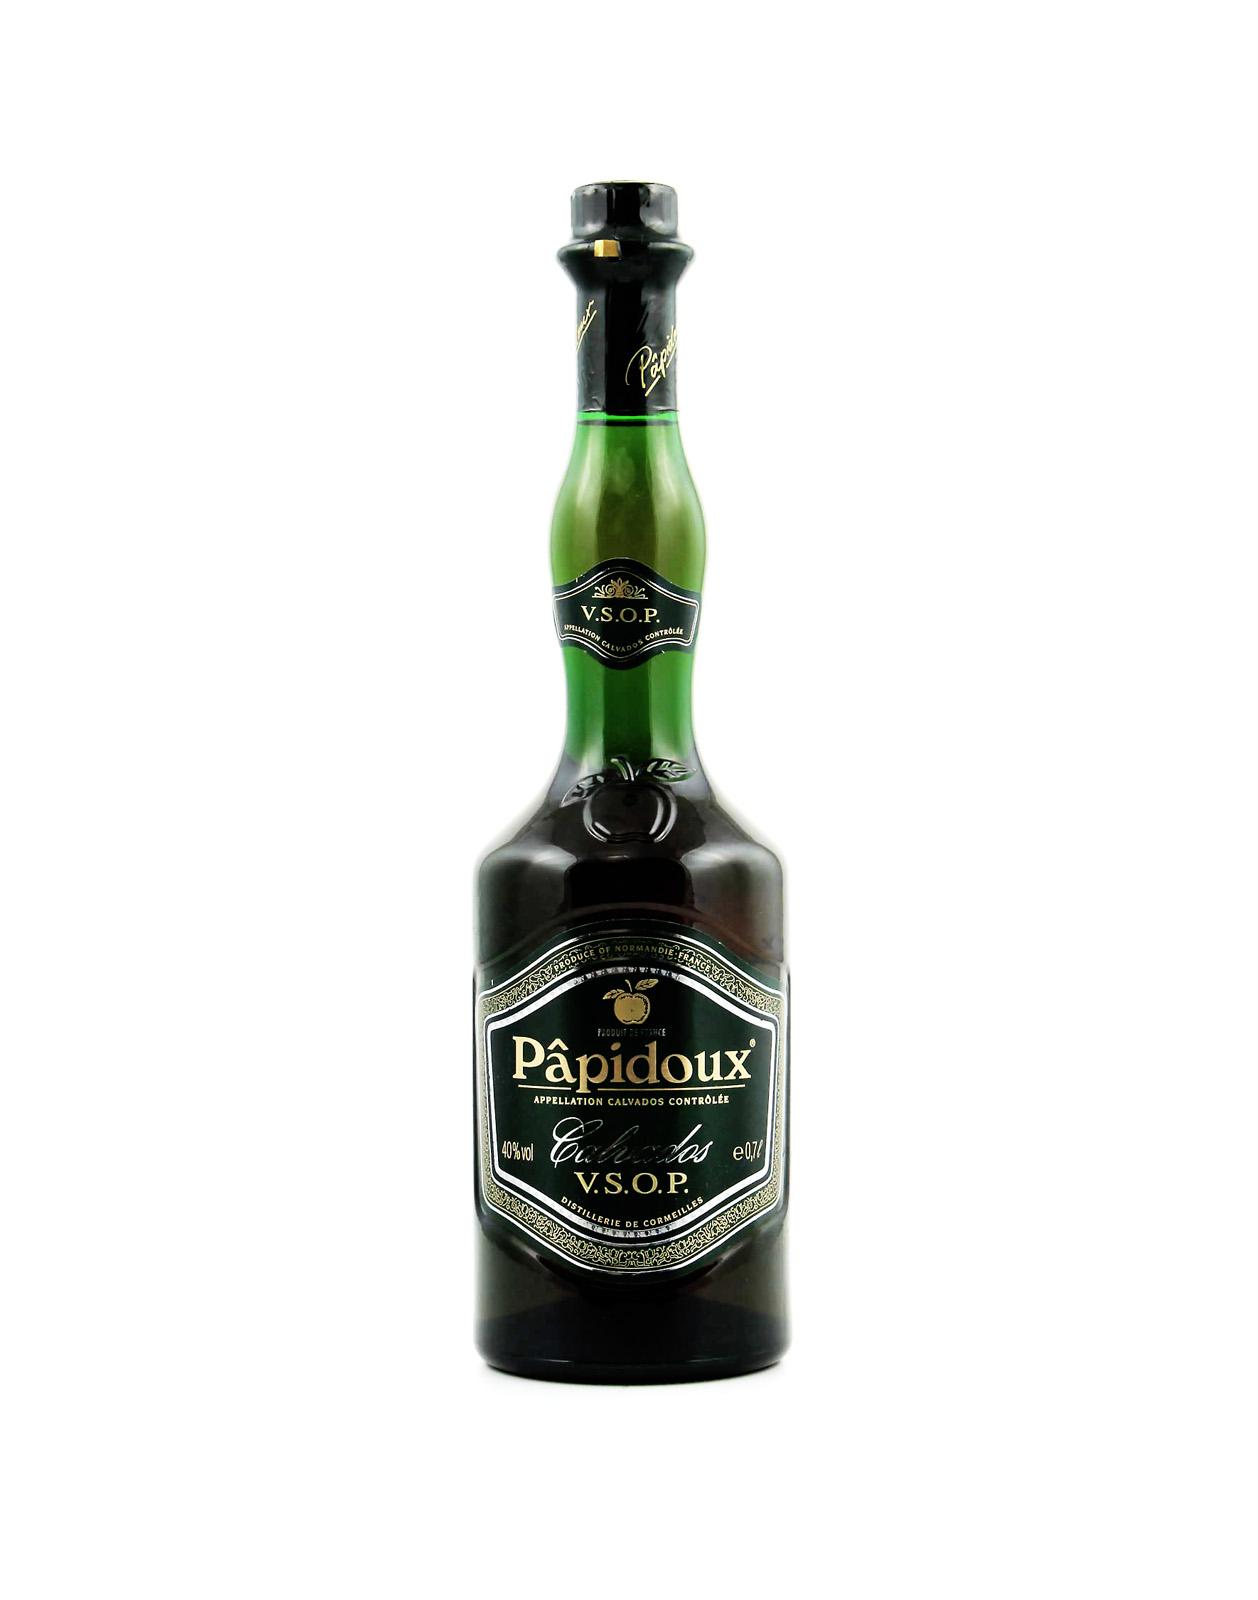 Papidoux calvados VSOP 0,7L 40% destiláty calvados, Bottleshop Sunny wines slnecnice mesto, petrzalka, destiláty, rozvoz alkoholu, eshop